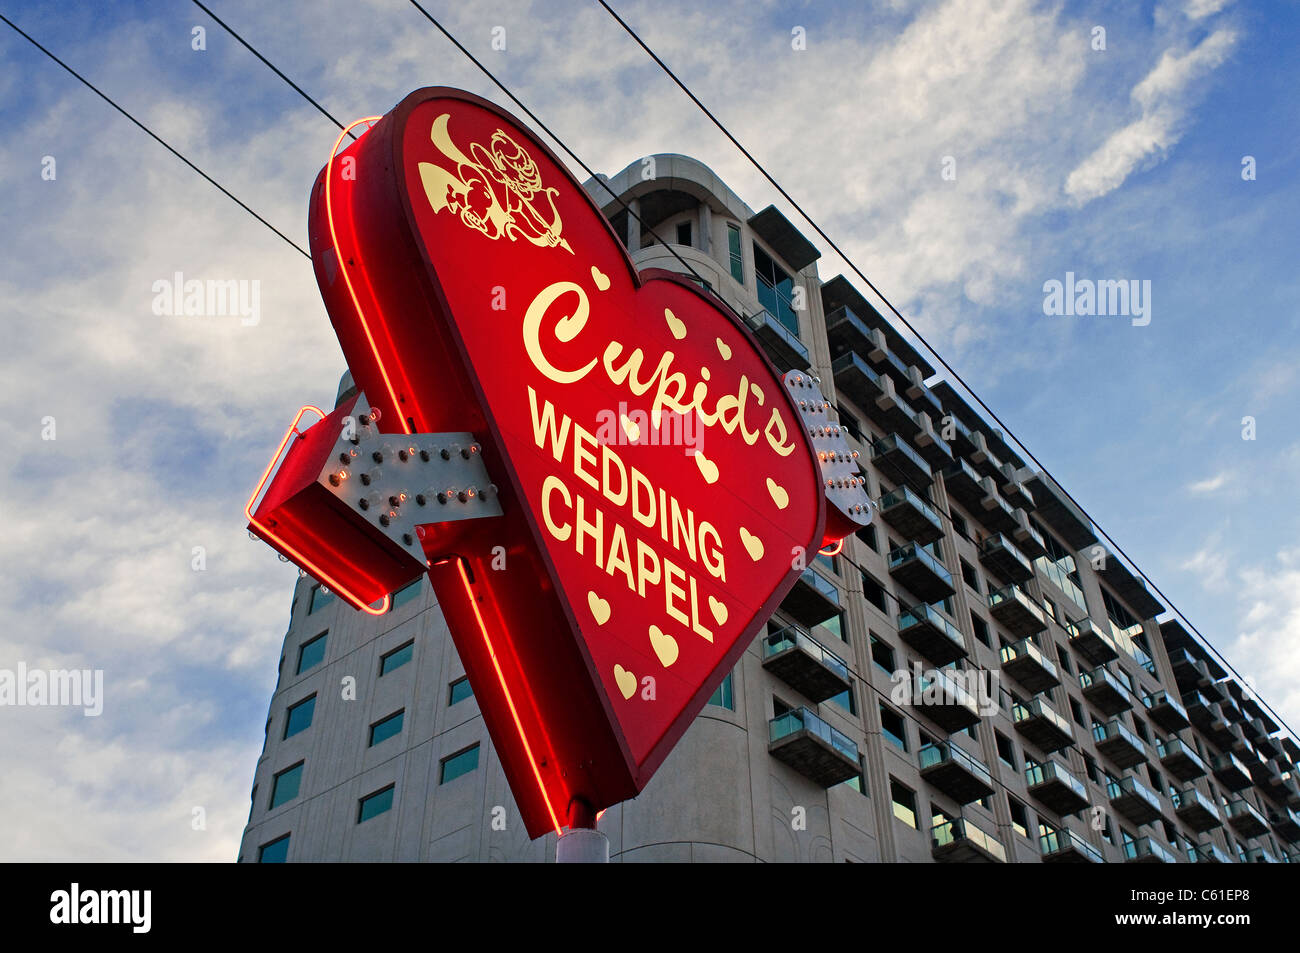 Hochzeit Kapelle Cupids Las Vegas NV Nevada Stockbild